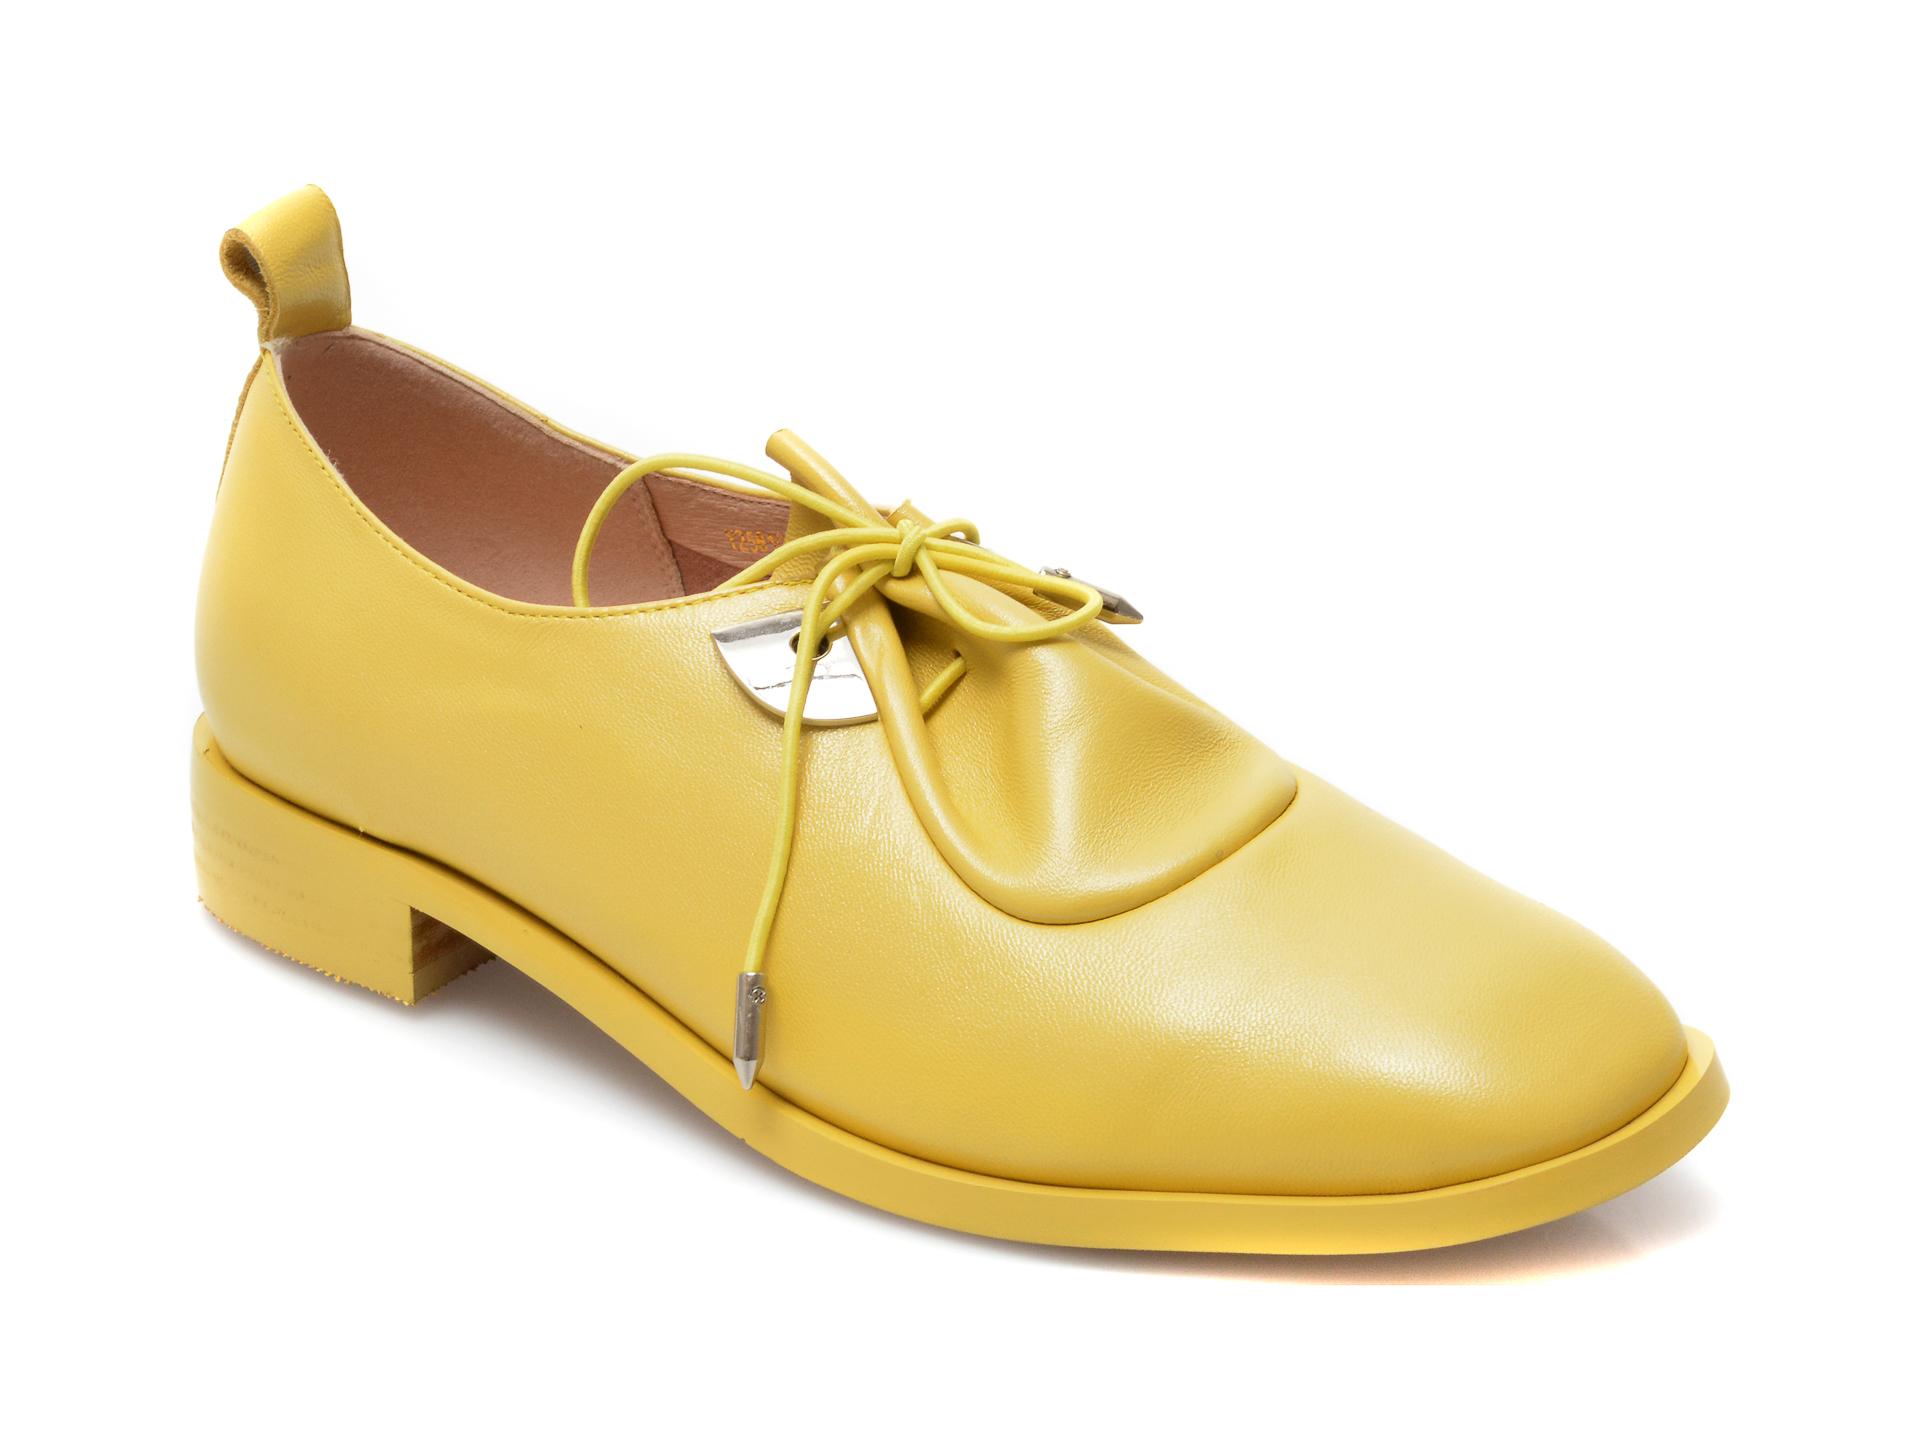 Pantofi EPICA galbeni, Y2561Q1, din piele naturala